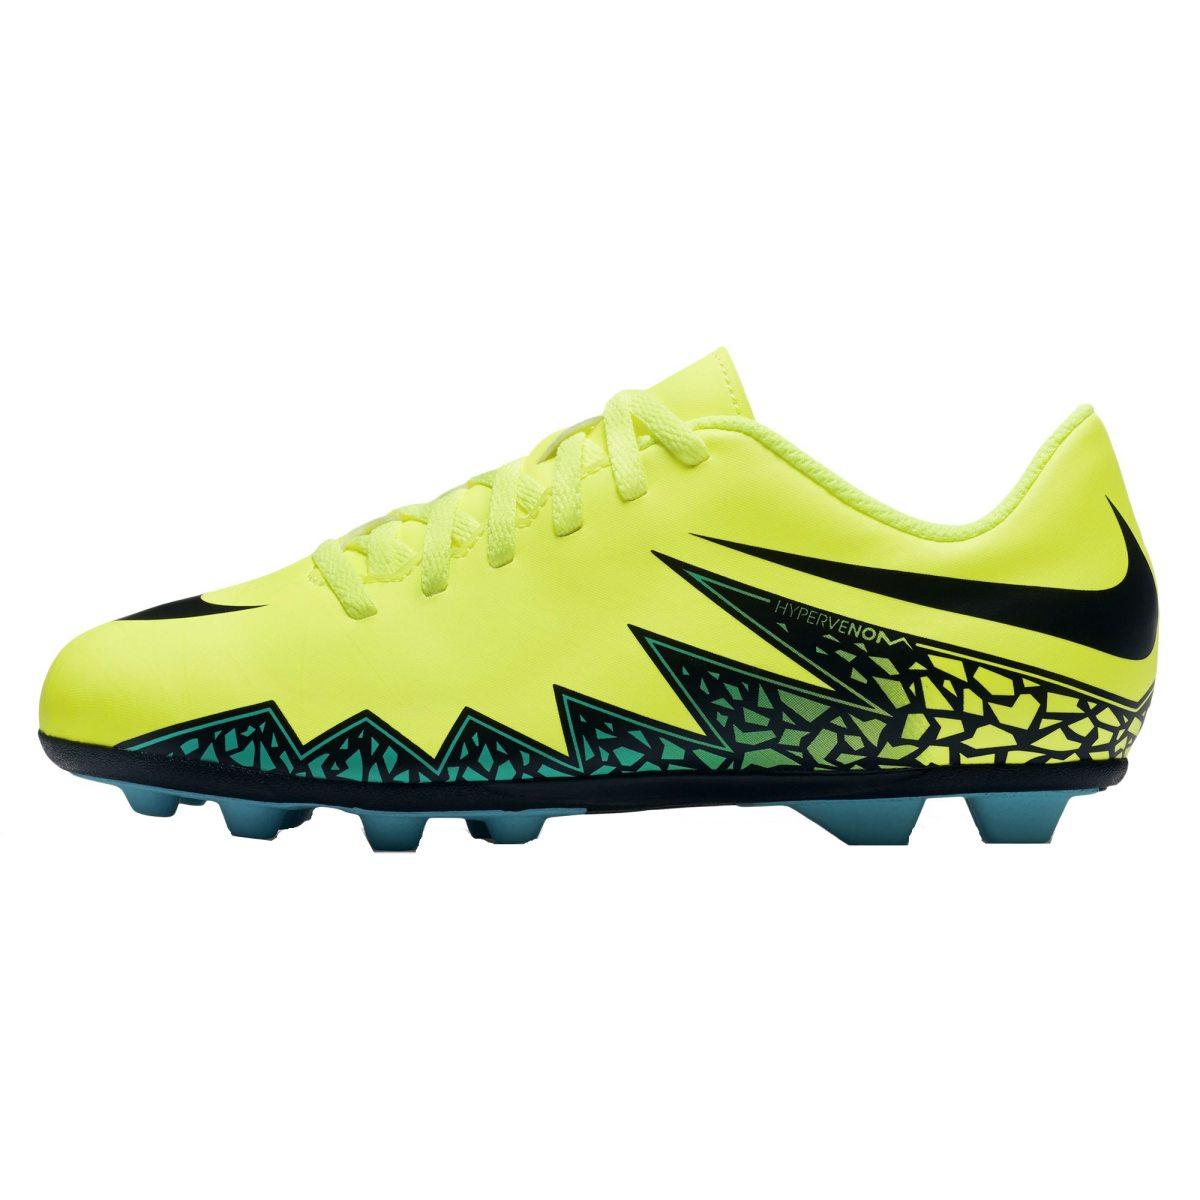 on sale ed7d3 4363b nike hypervenom phade ii fg r q3 16 fotbollssko junior fotbollsskor